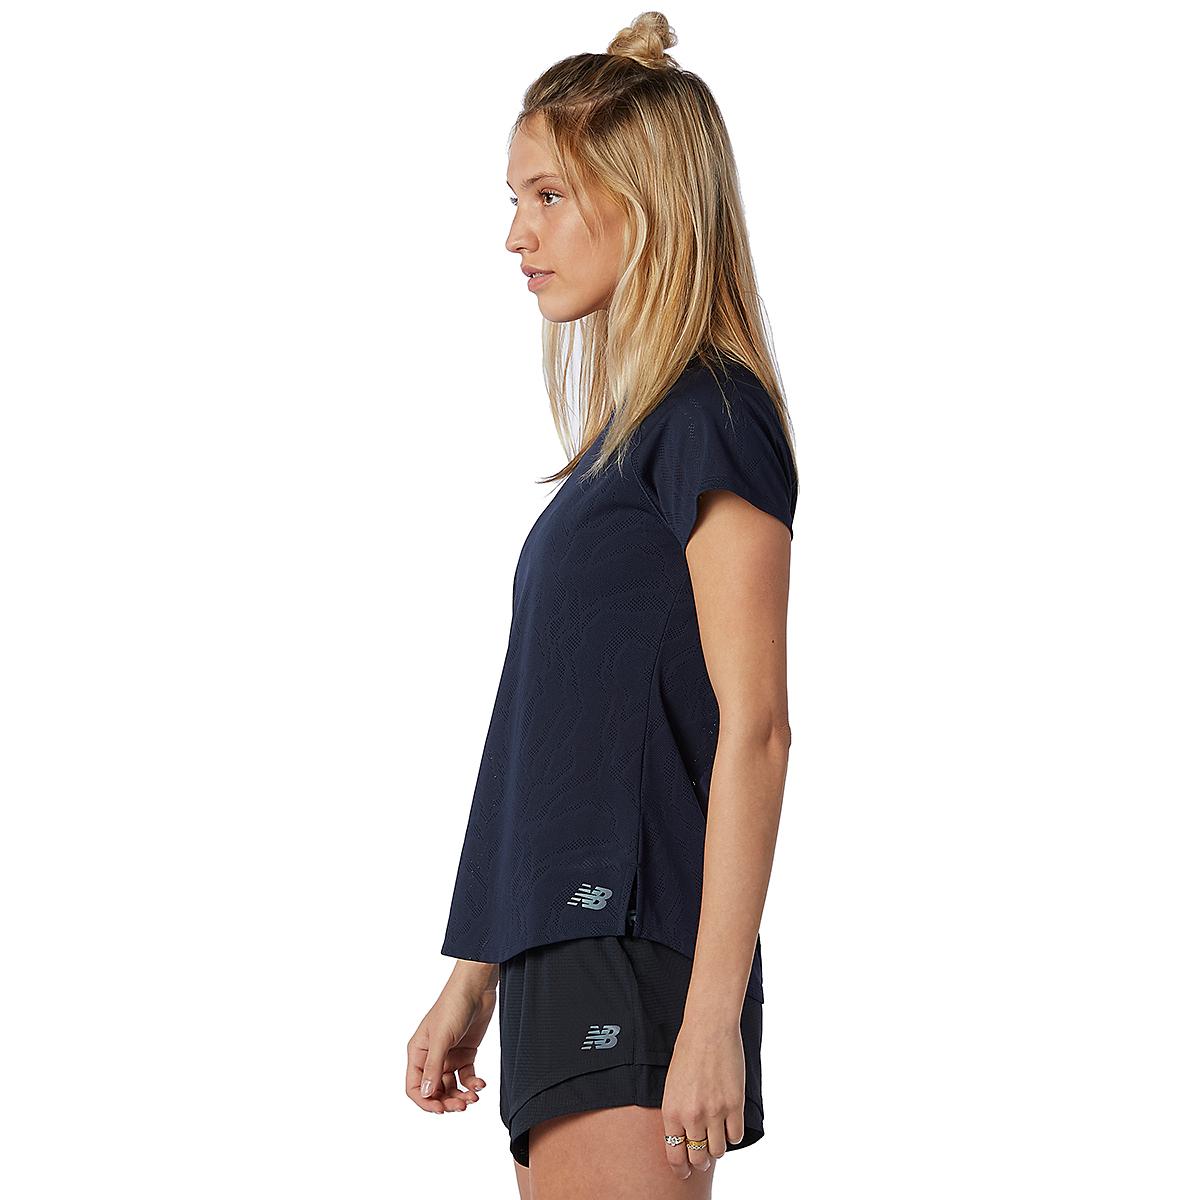 Women's New Balance Q Speed Fuel Jacquard Short Sleeve - Color: Eclipse - Size: XS, Eclipse, large, image 3